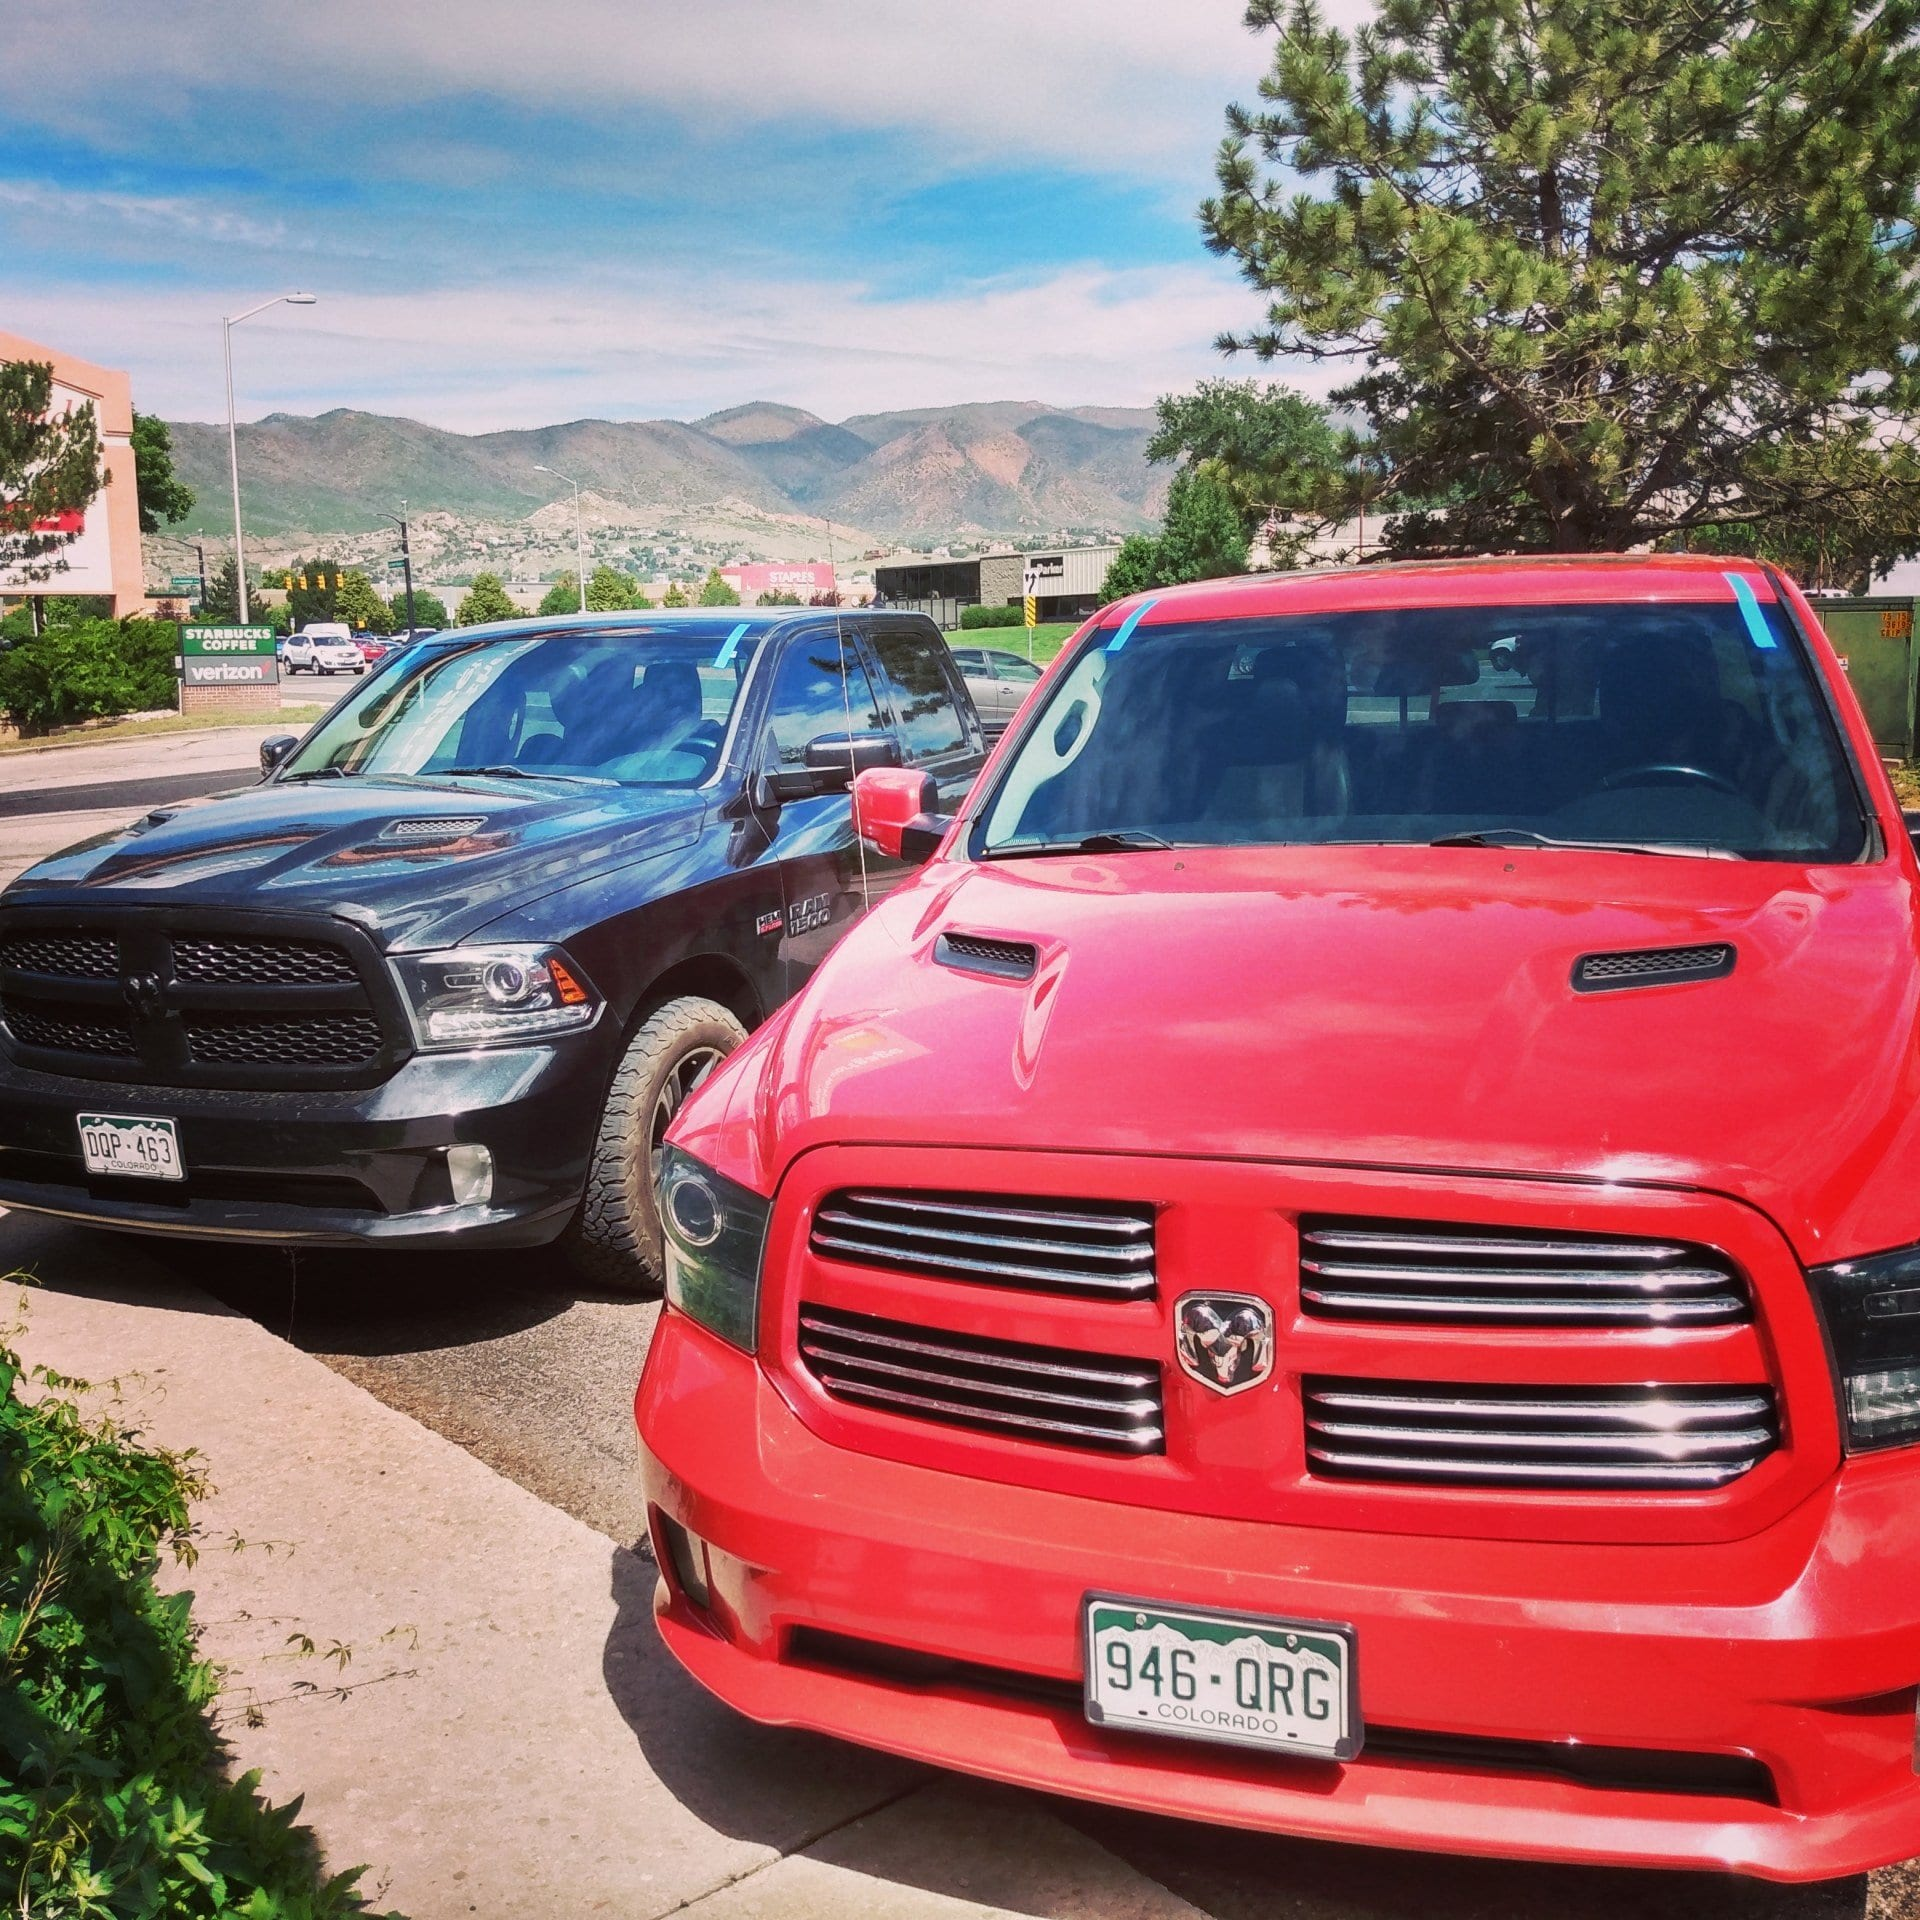 Snow Auto Glass Windshield Replacement Dodge Trucks Colorado Springs